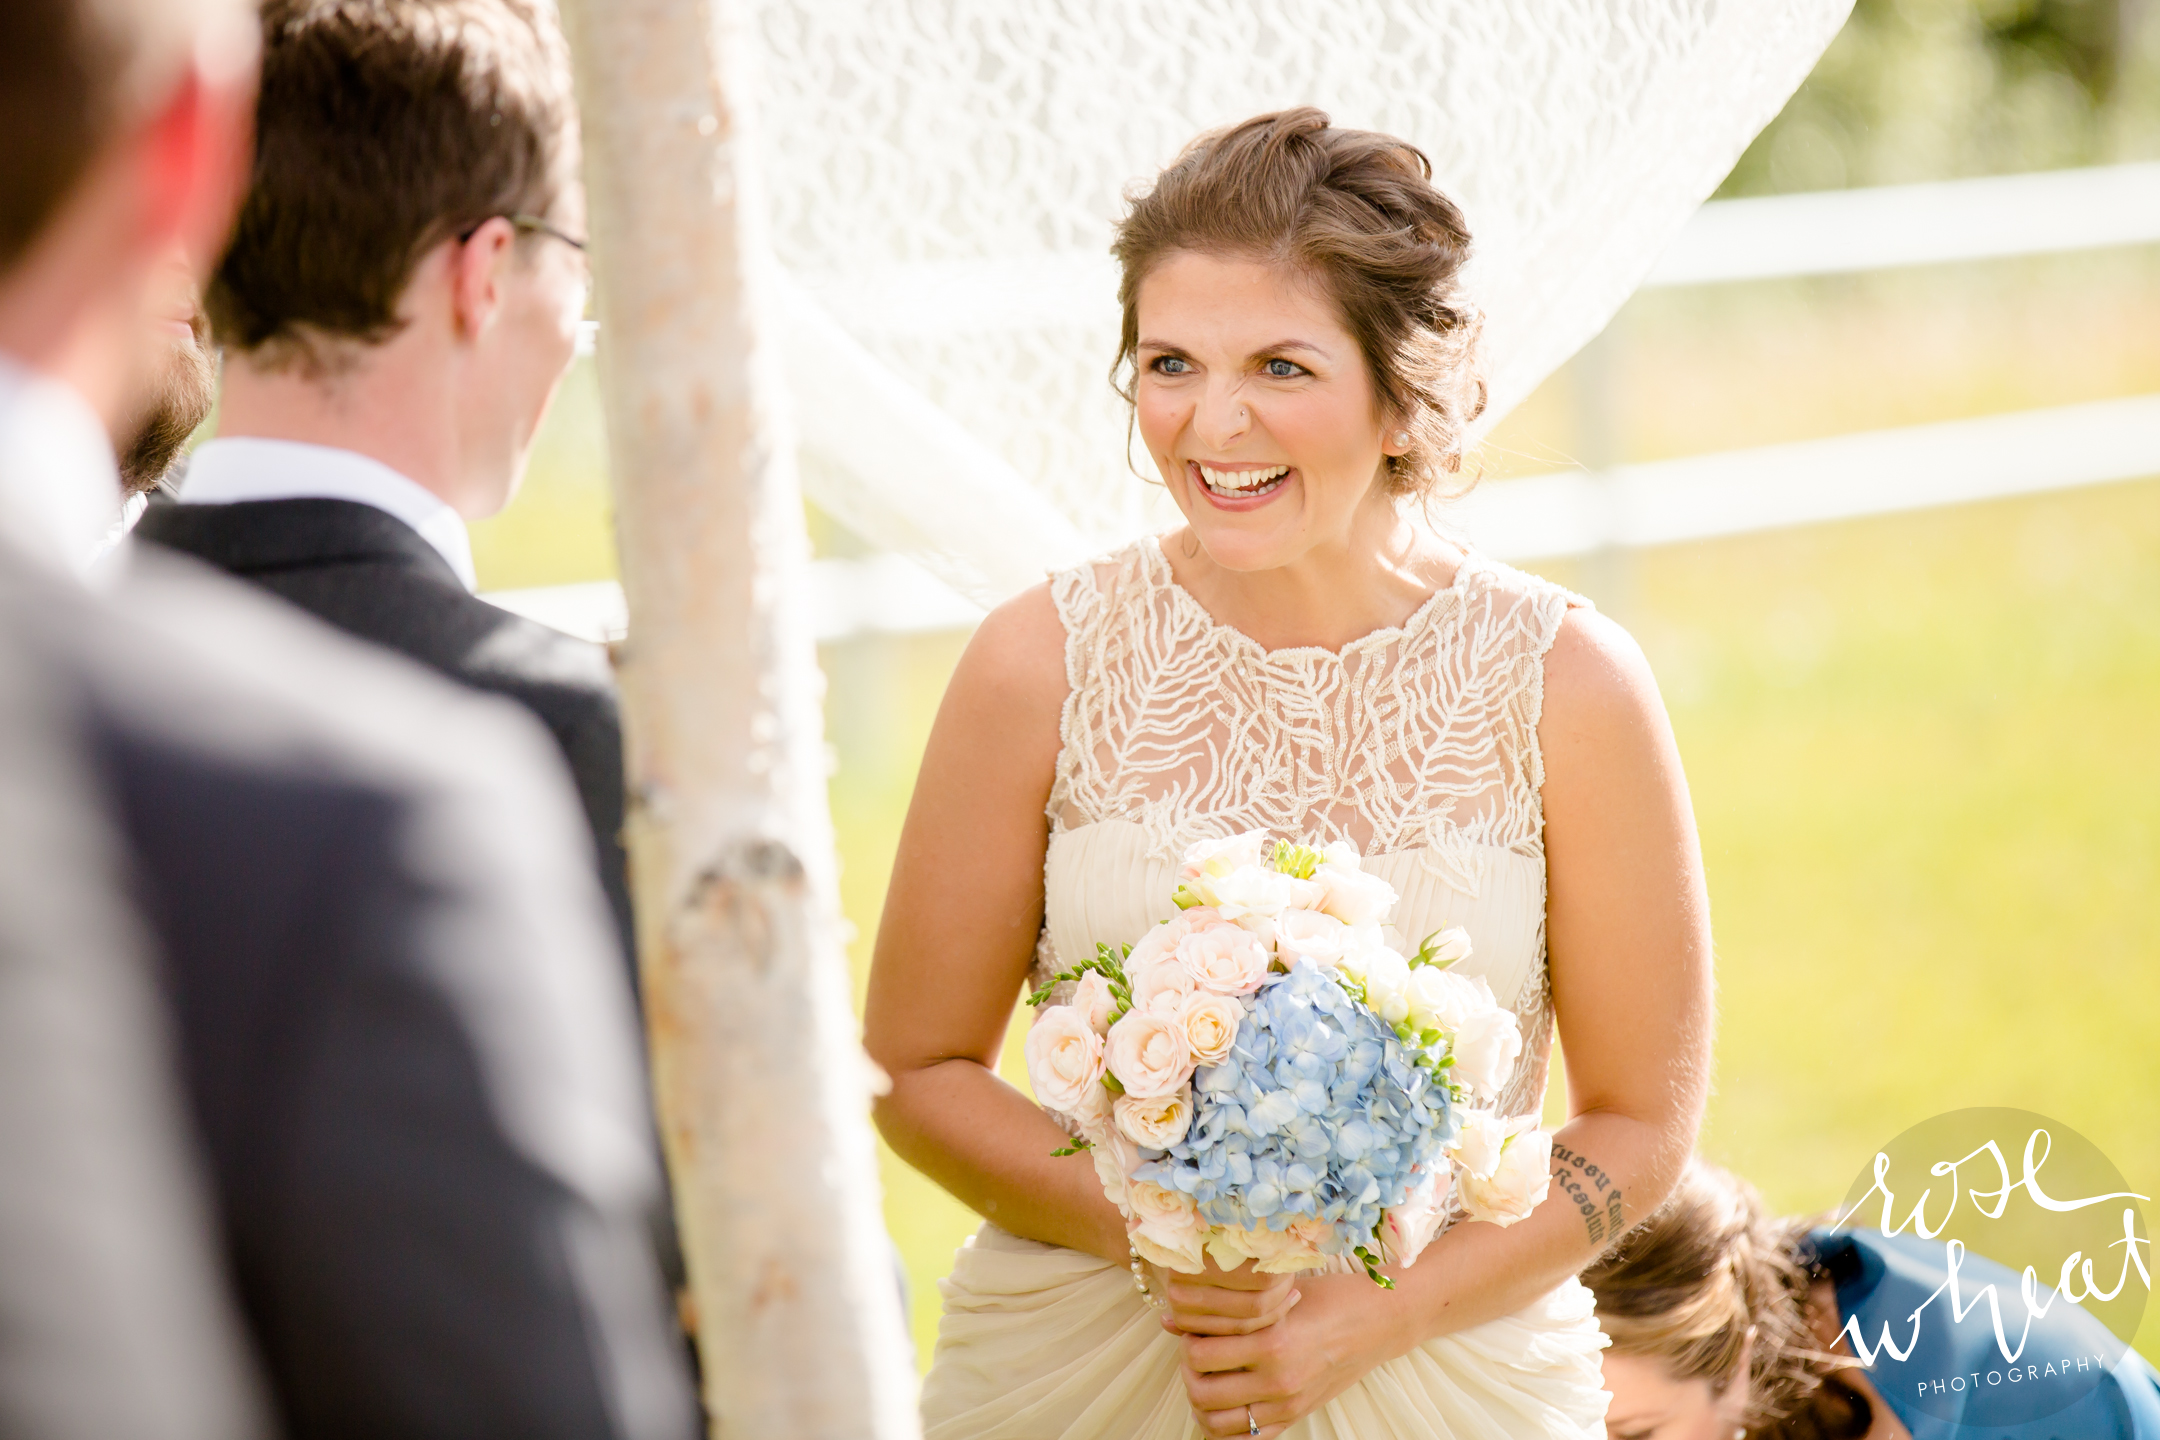 12. Birch_Hill_Fairbanks_Ak_Wedding_Rose_Wheat_Photogrpahy-1.jpg-09.jpg